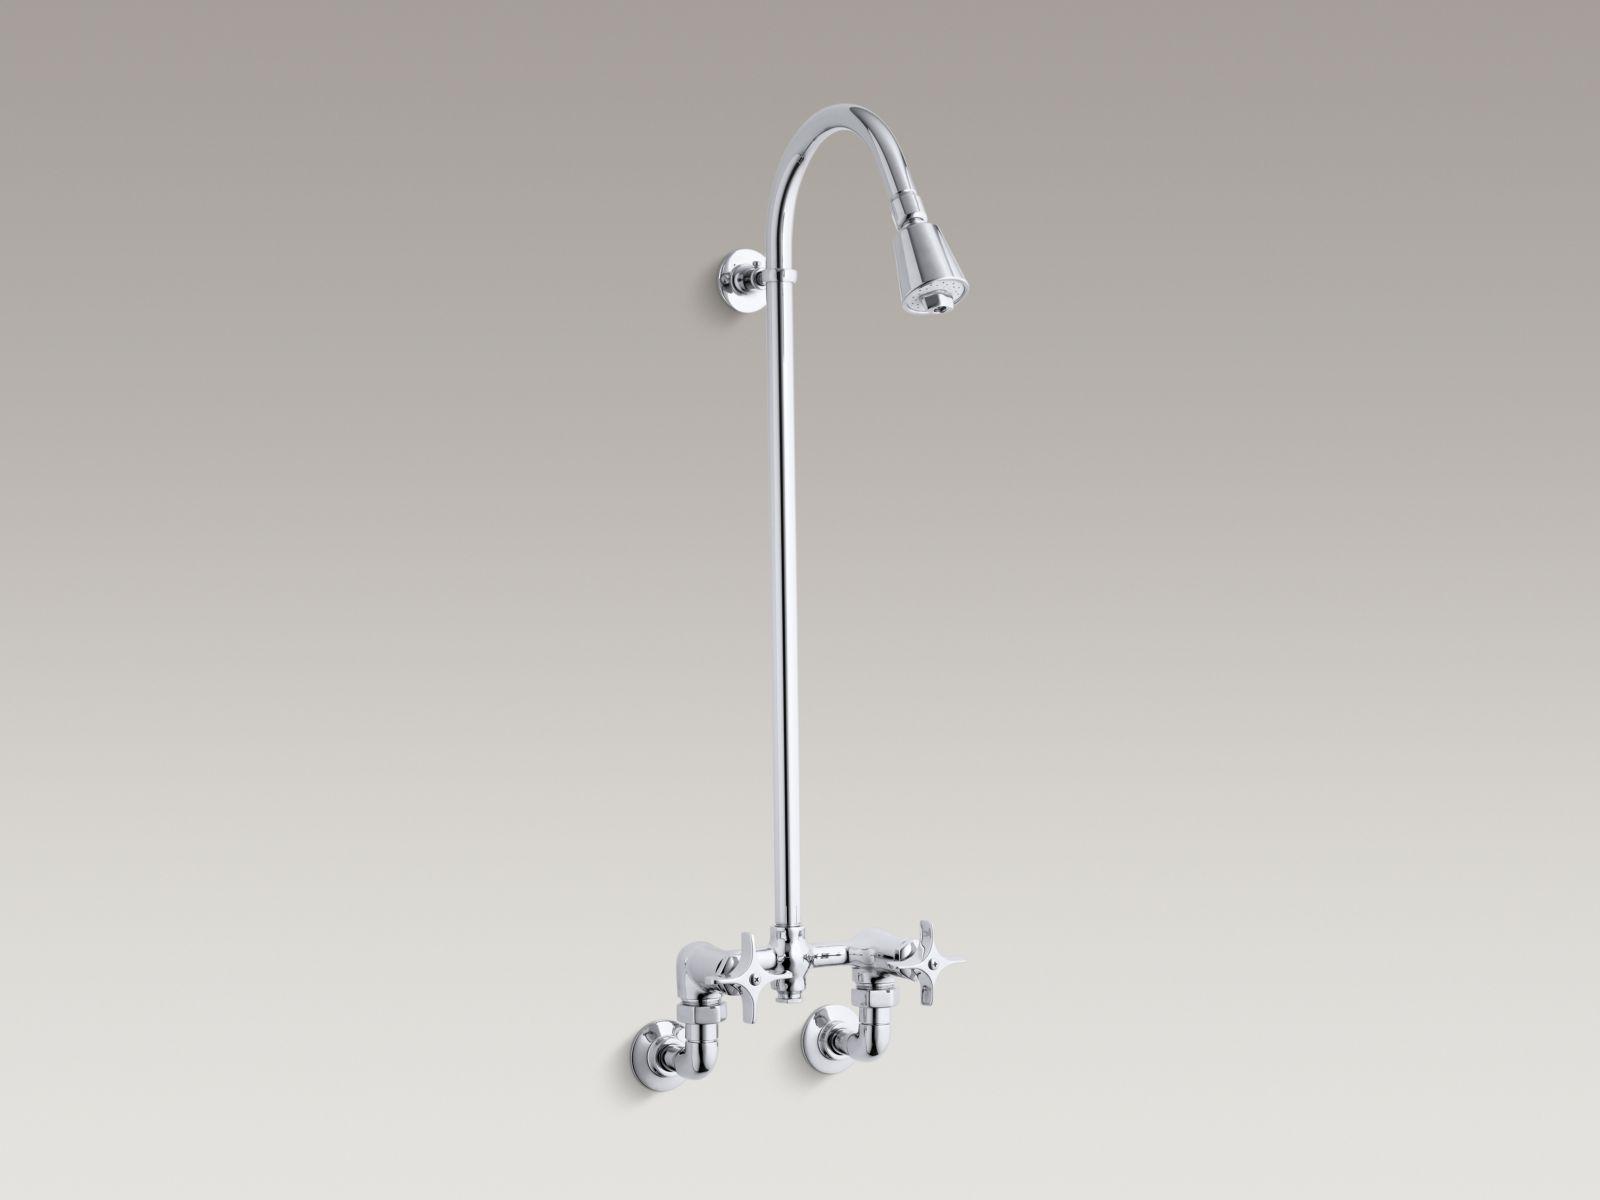 Kohler K-7252-CP Industrial Exposed Shower Polished Chrome